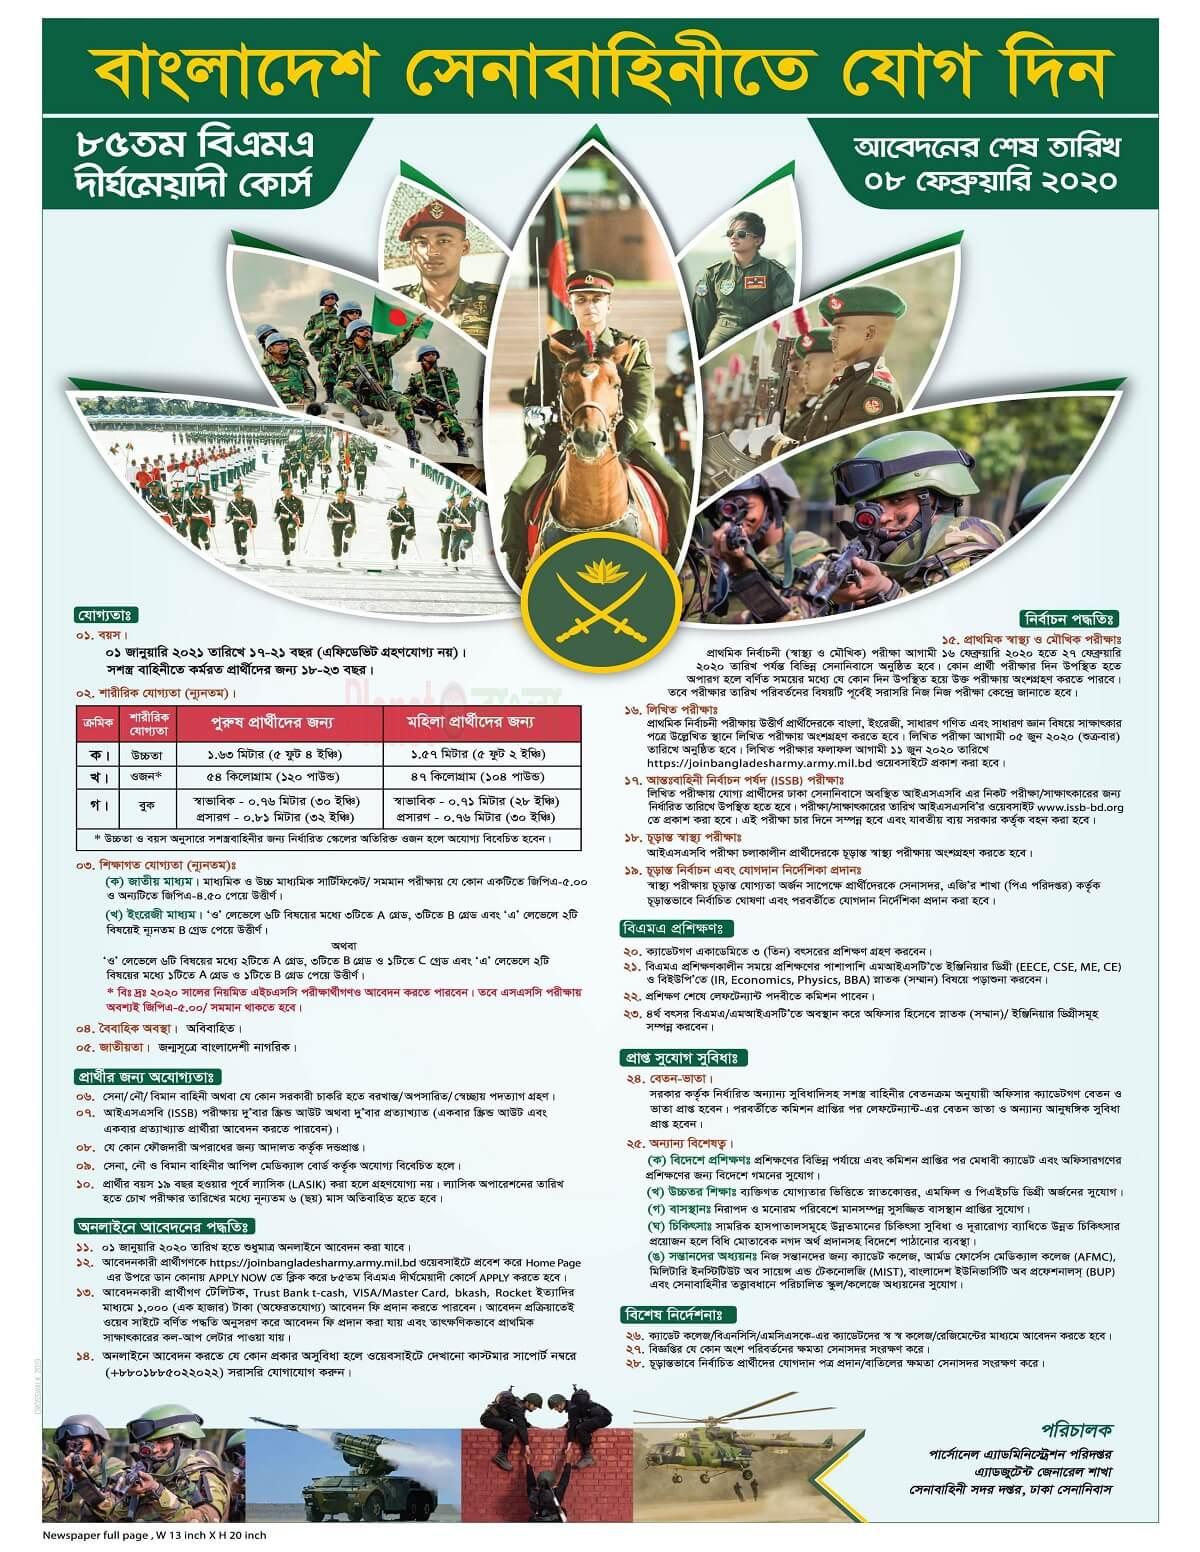 army circular 2020